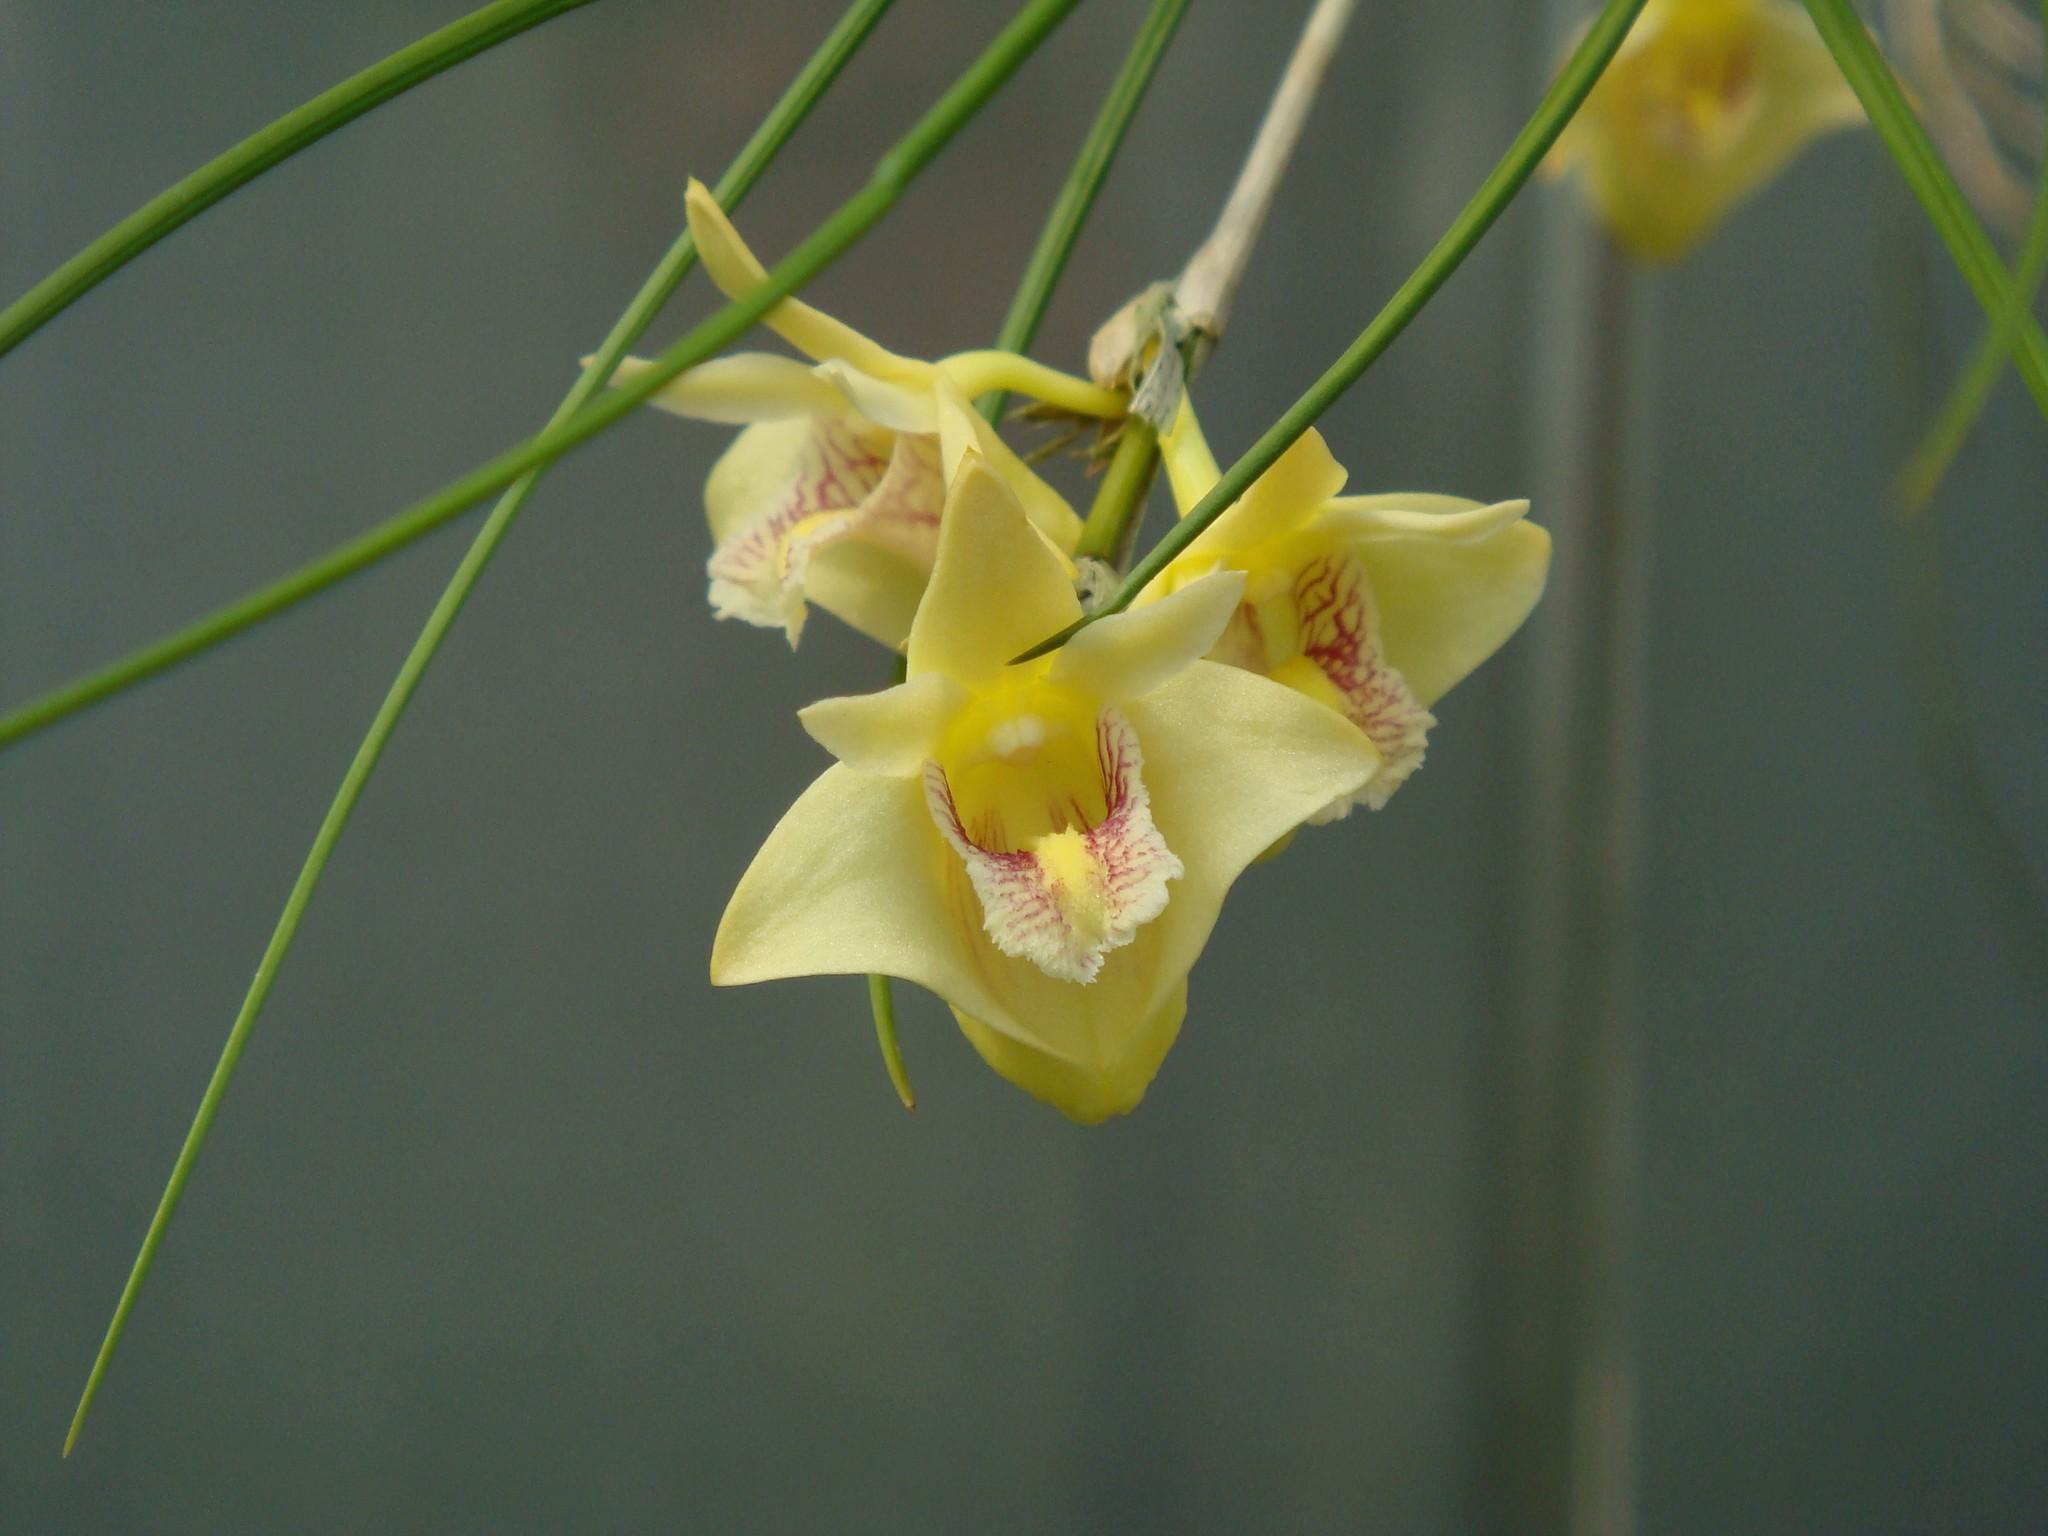 http://orchids.la.coocan.jp/Dendrobium/Dendrobium%20junceum/DSC04507.JPG